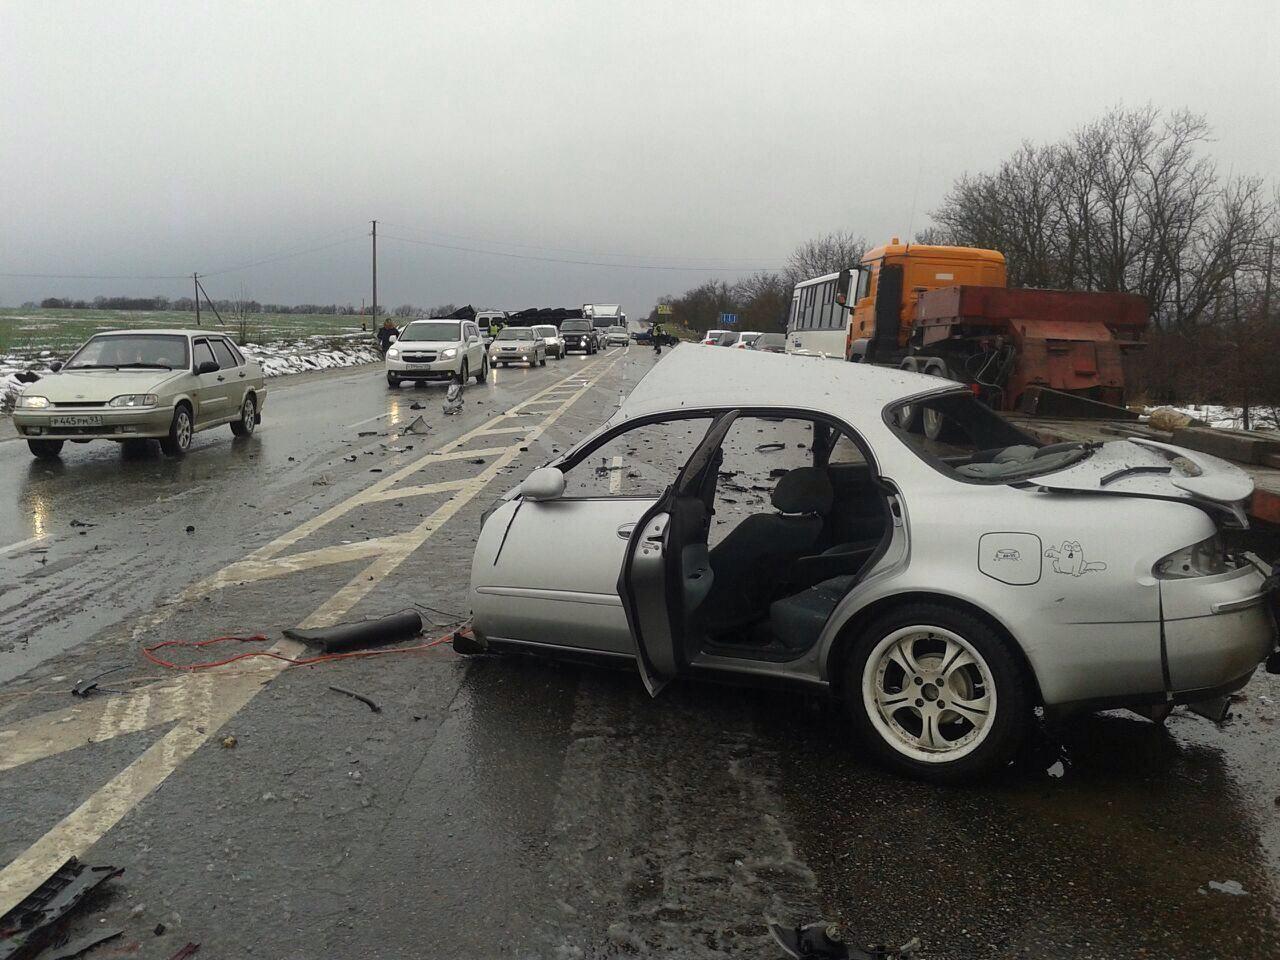 НаКубани вДТП попали 5 машин, пострадали 4 человека